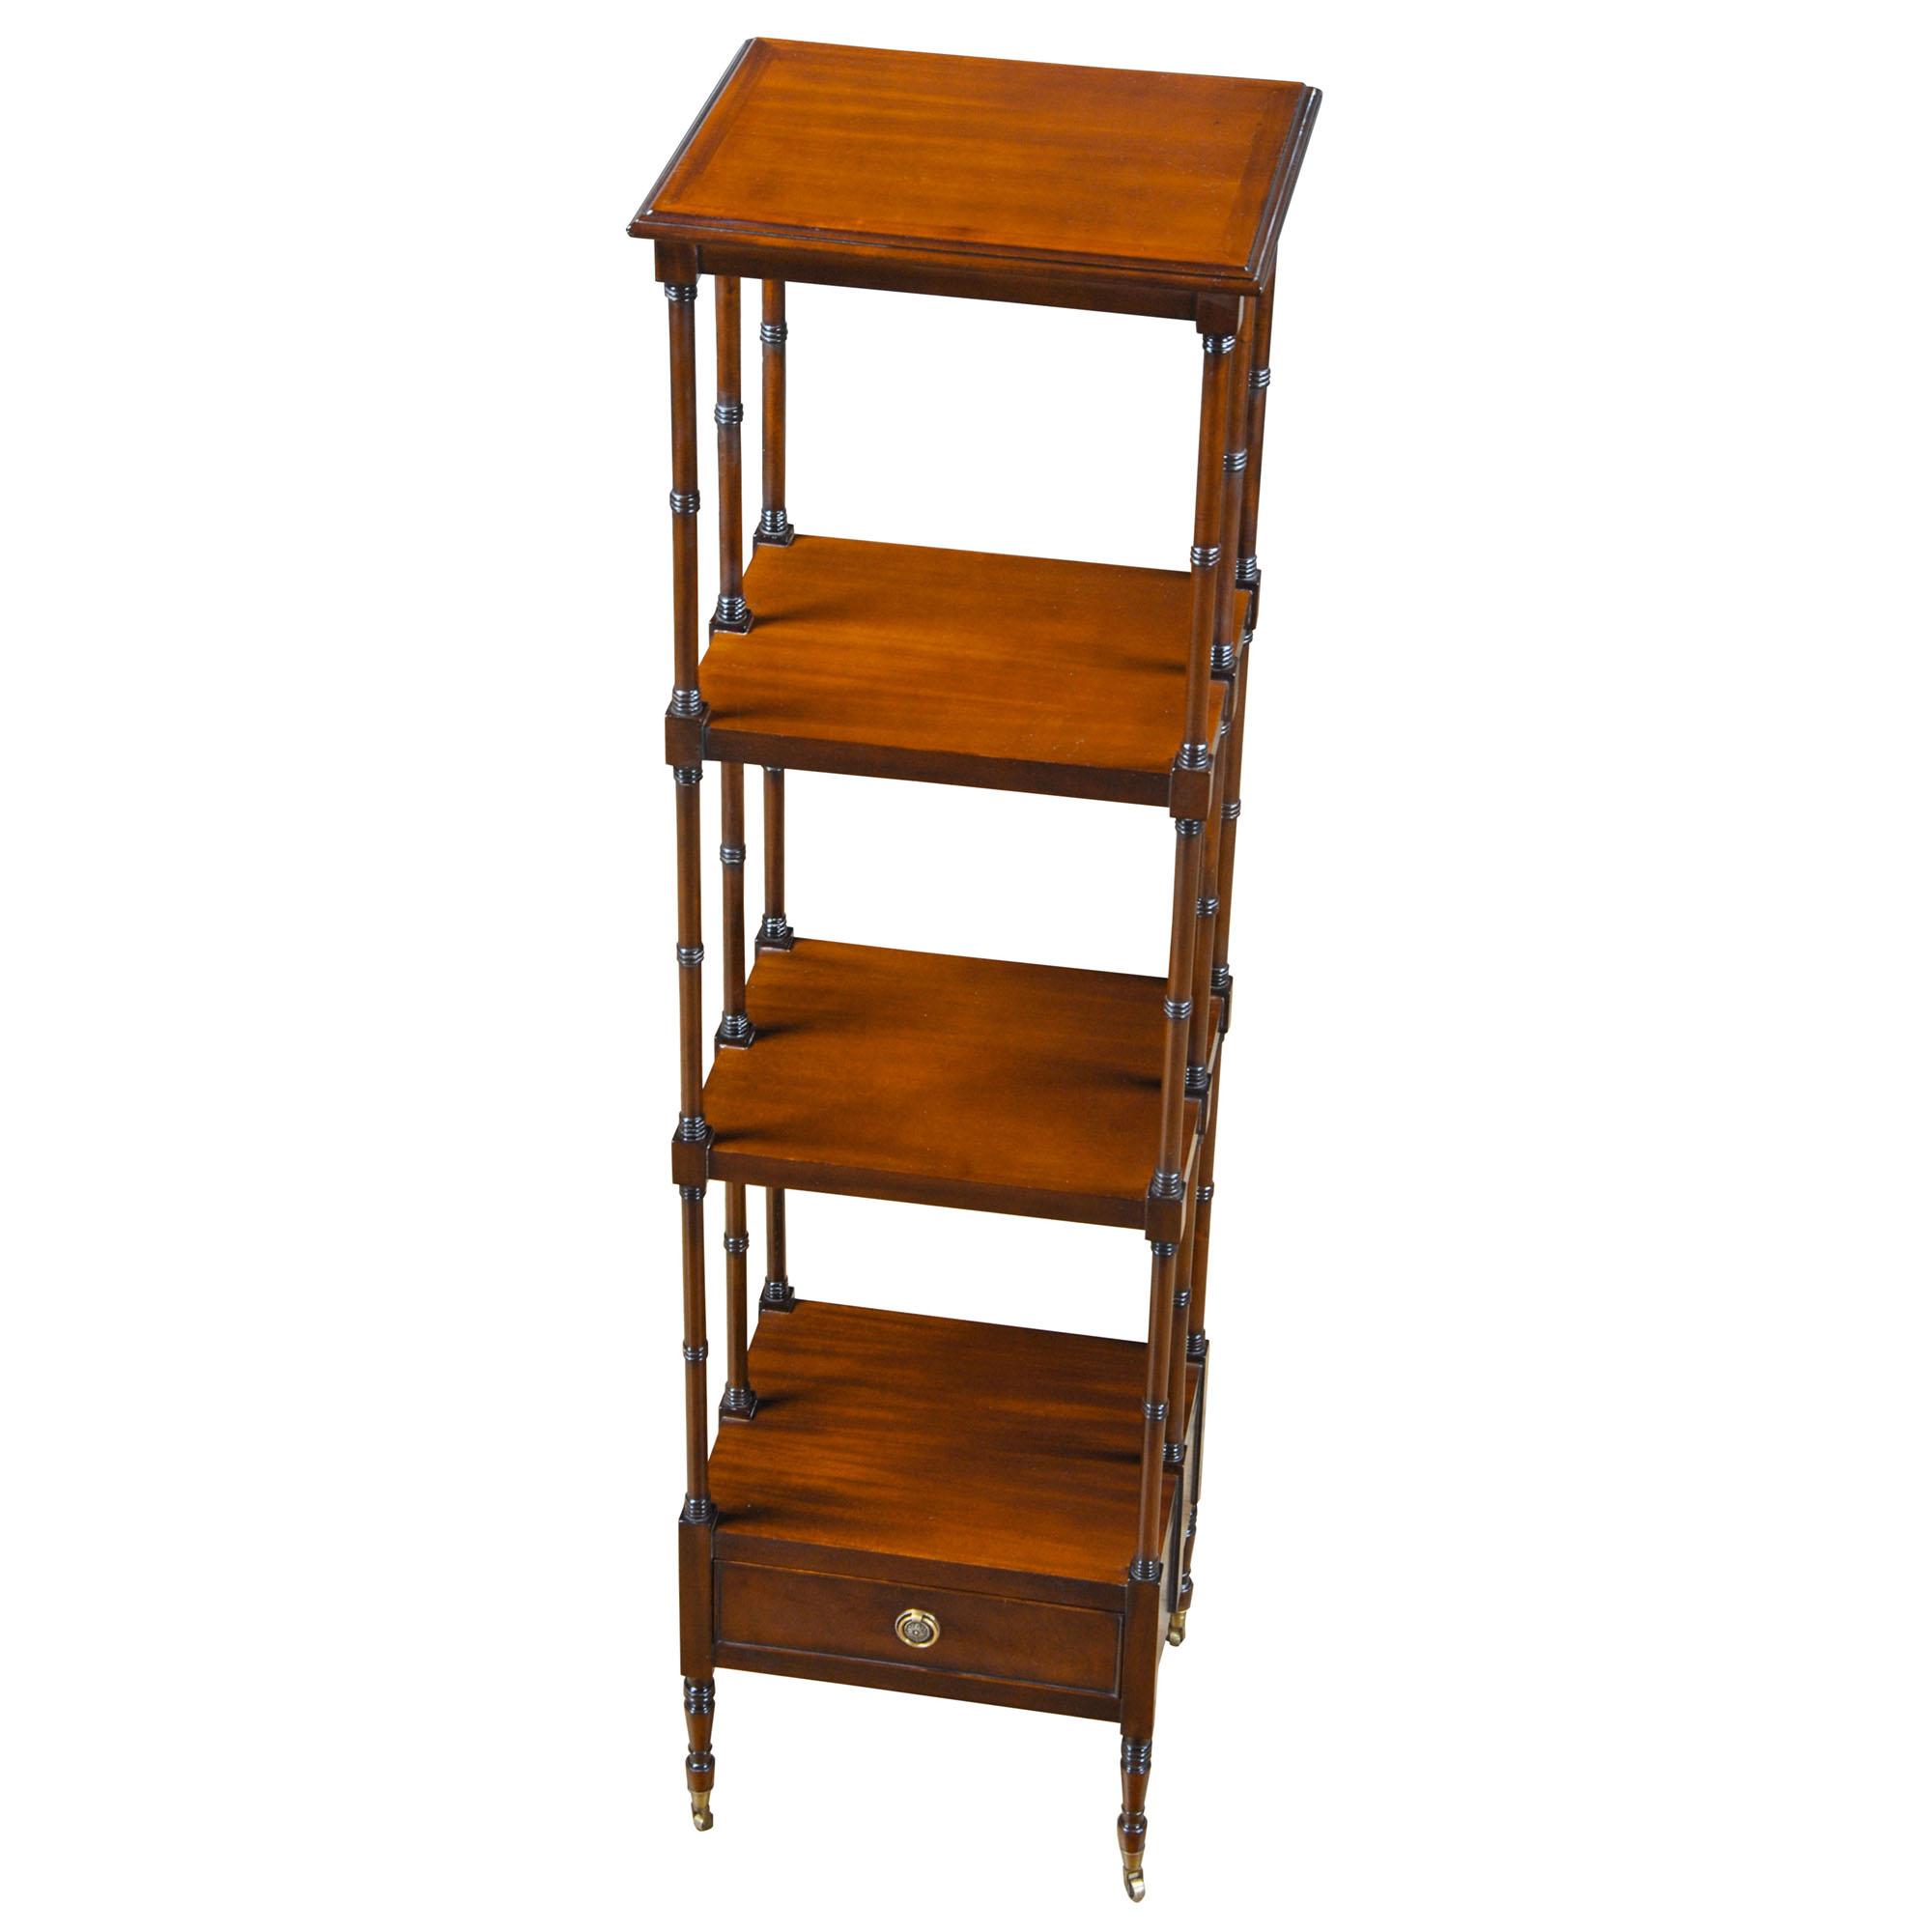 Book Furniture: Mahogany Book Shelf, Niagara Furniture, Solid Brass Wheels